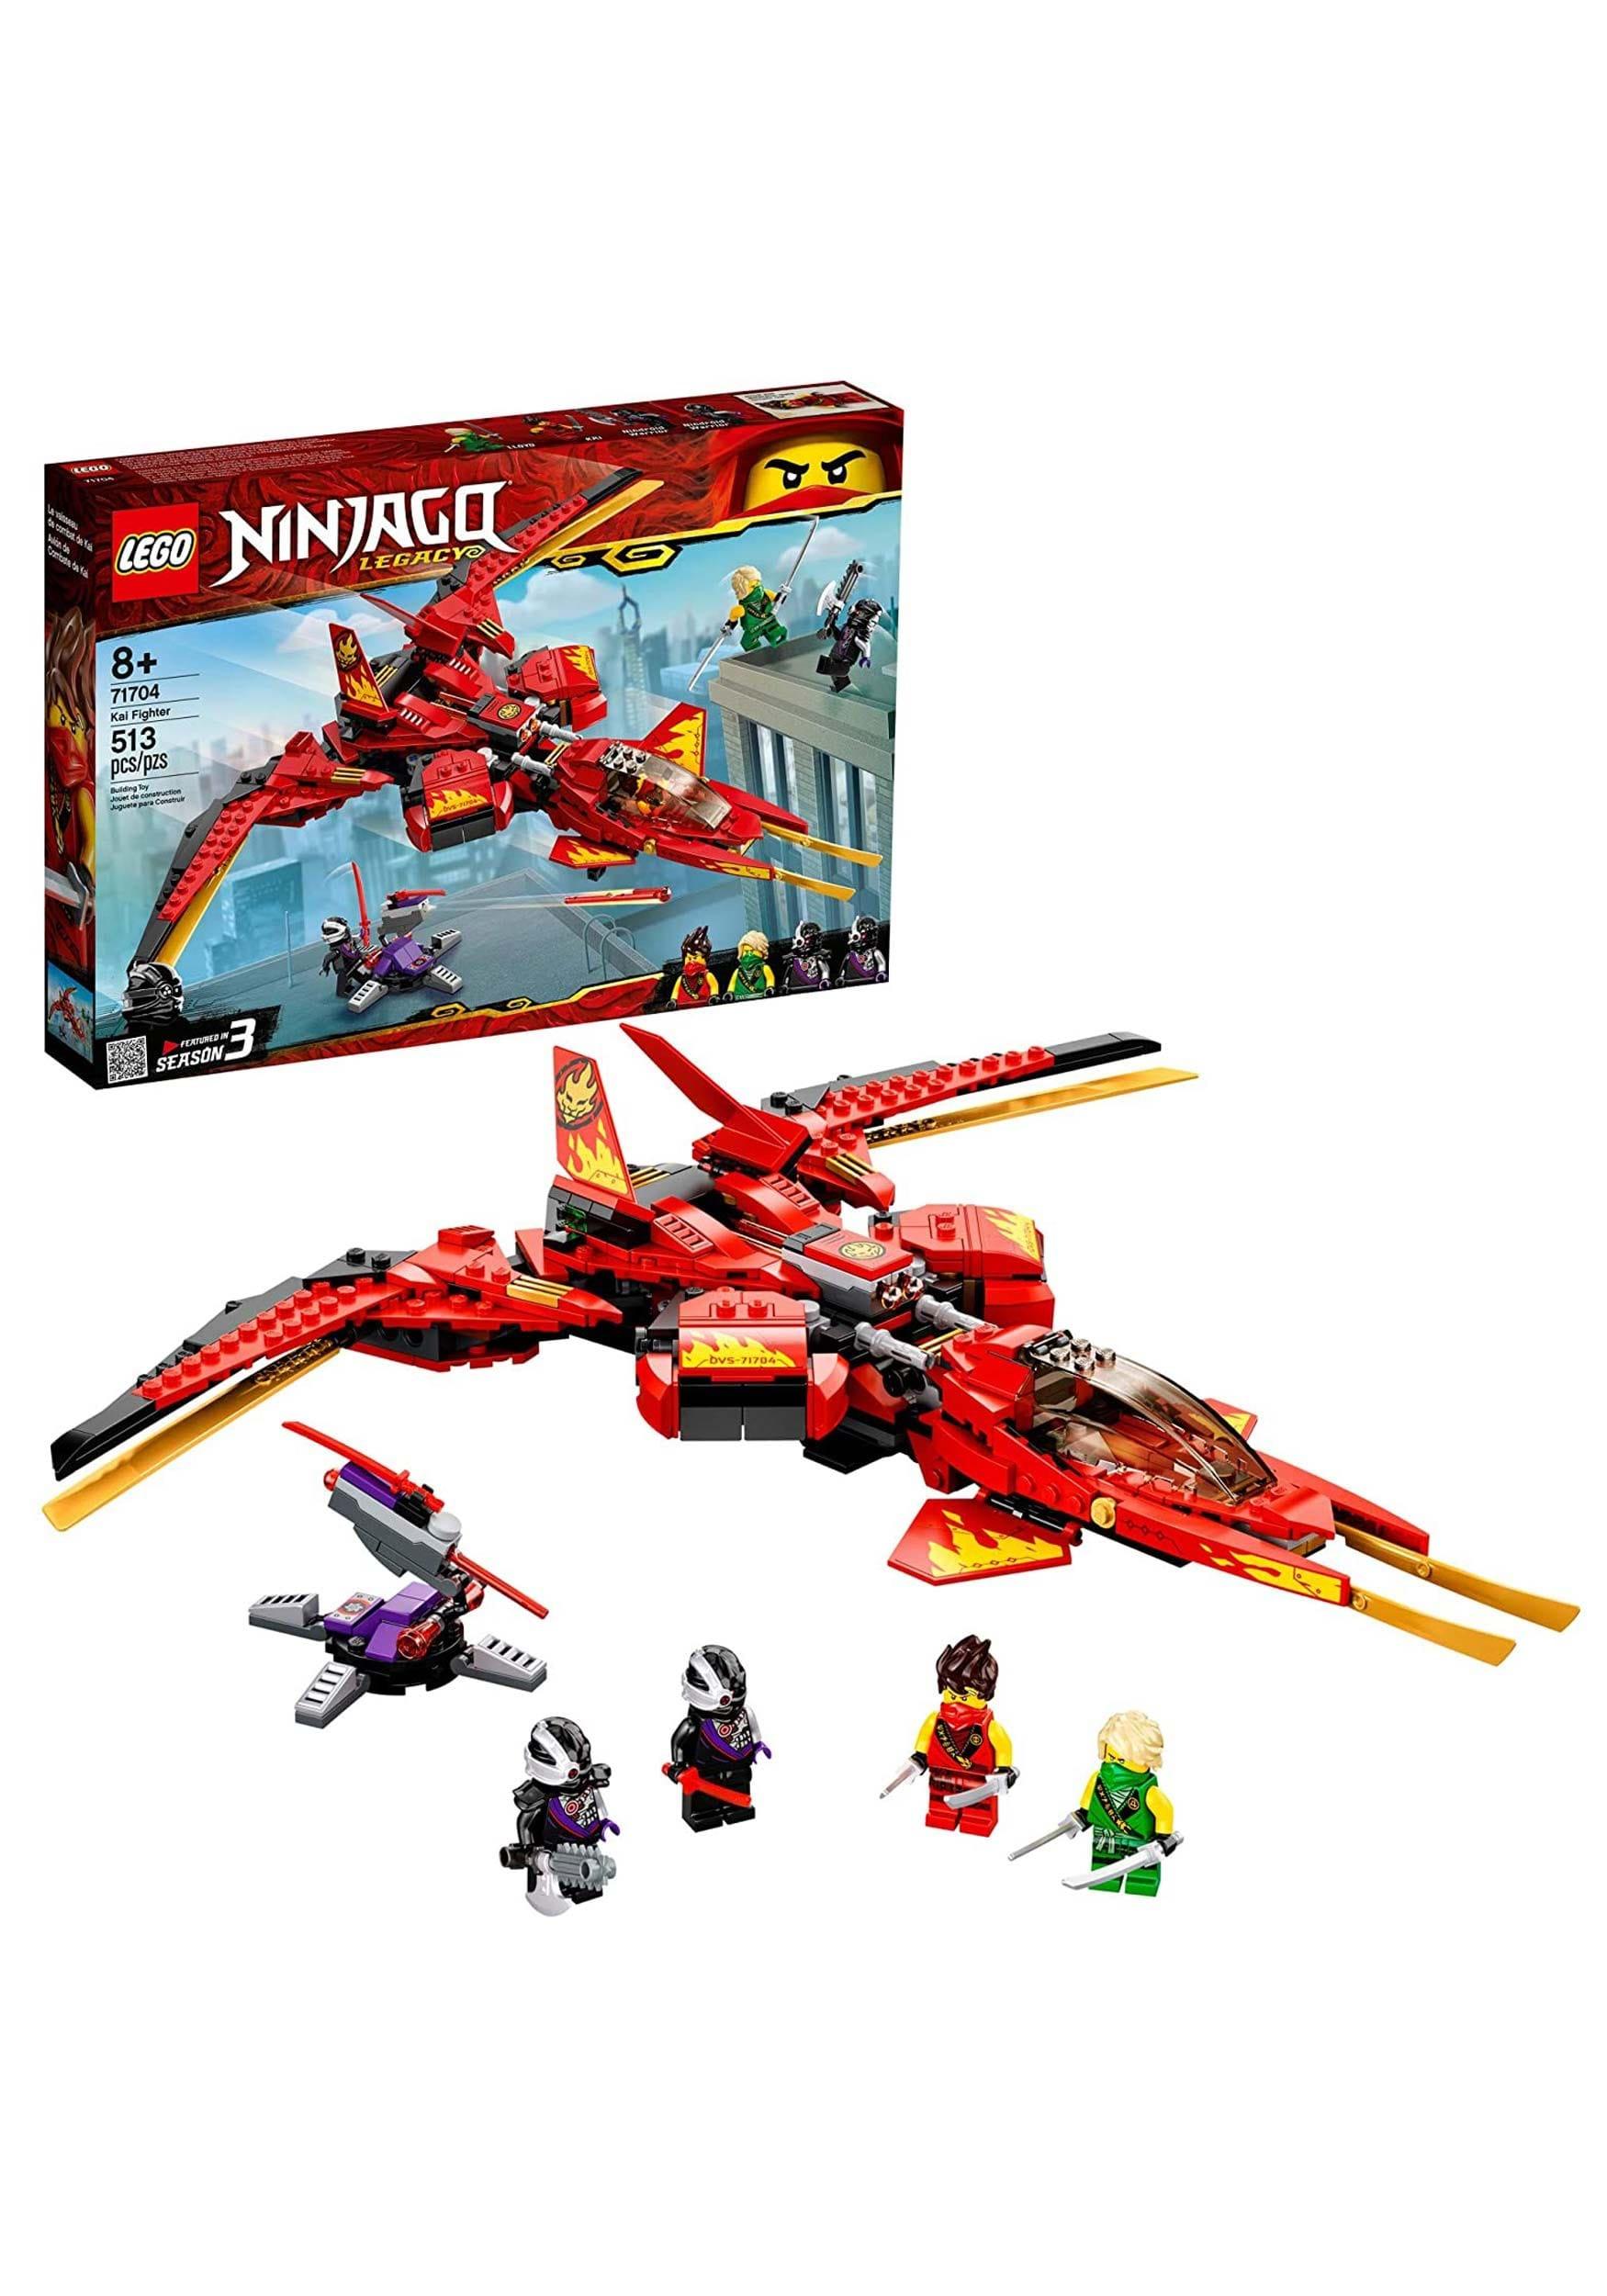 Ninjago Kai Fighter - LEGO